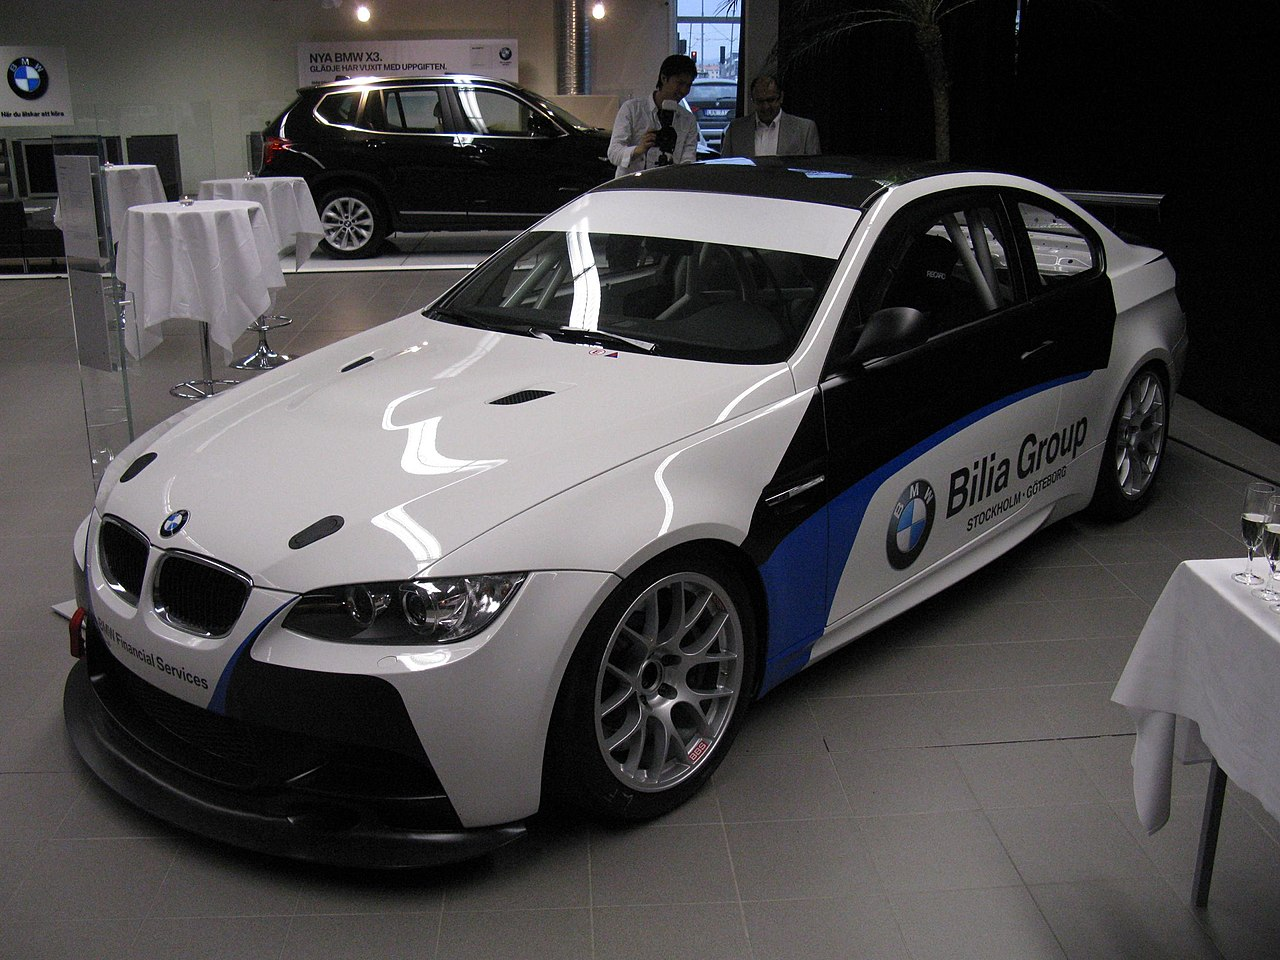 BMW Convertible bmw m3 gt4 File:BMW M3 GT4 Evo (5622342351).jpg - Wikimedia Commons